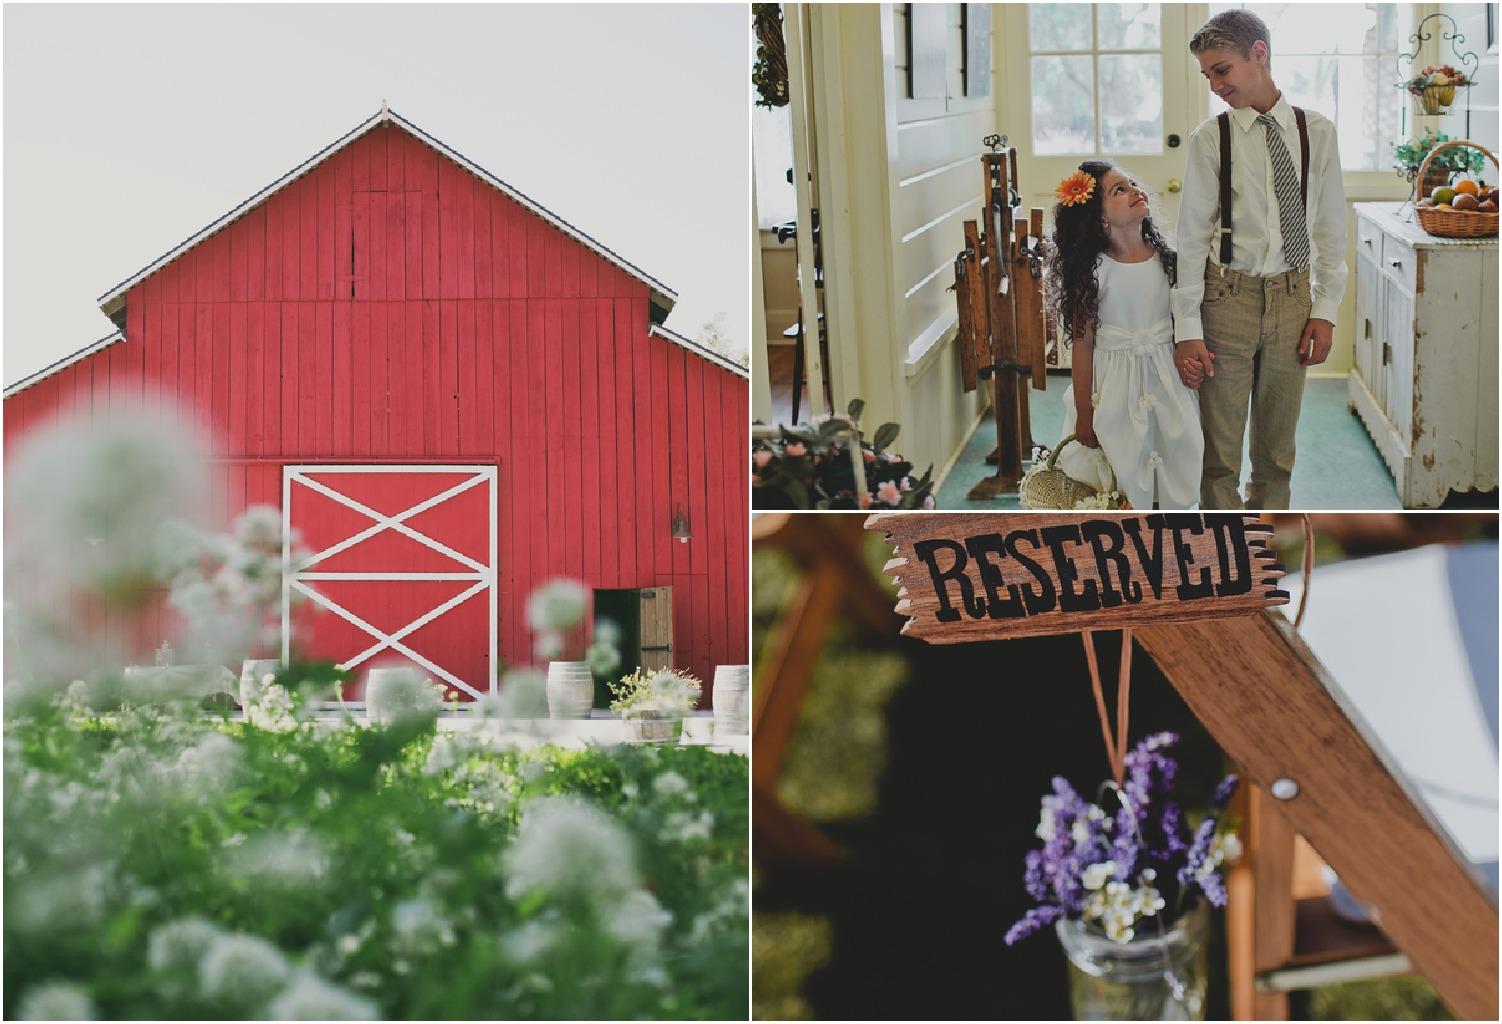 Southern California Barn Wedding - Rustic Wedding Chic